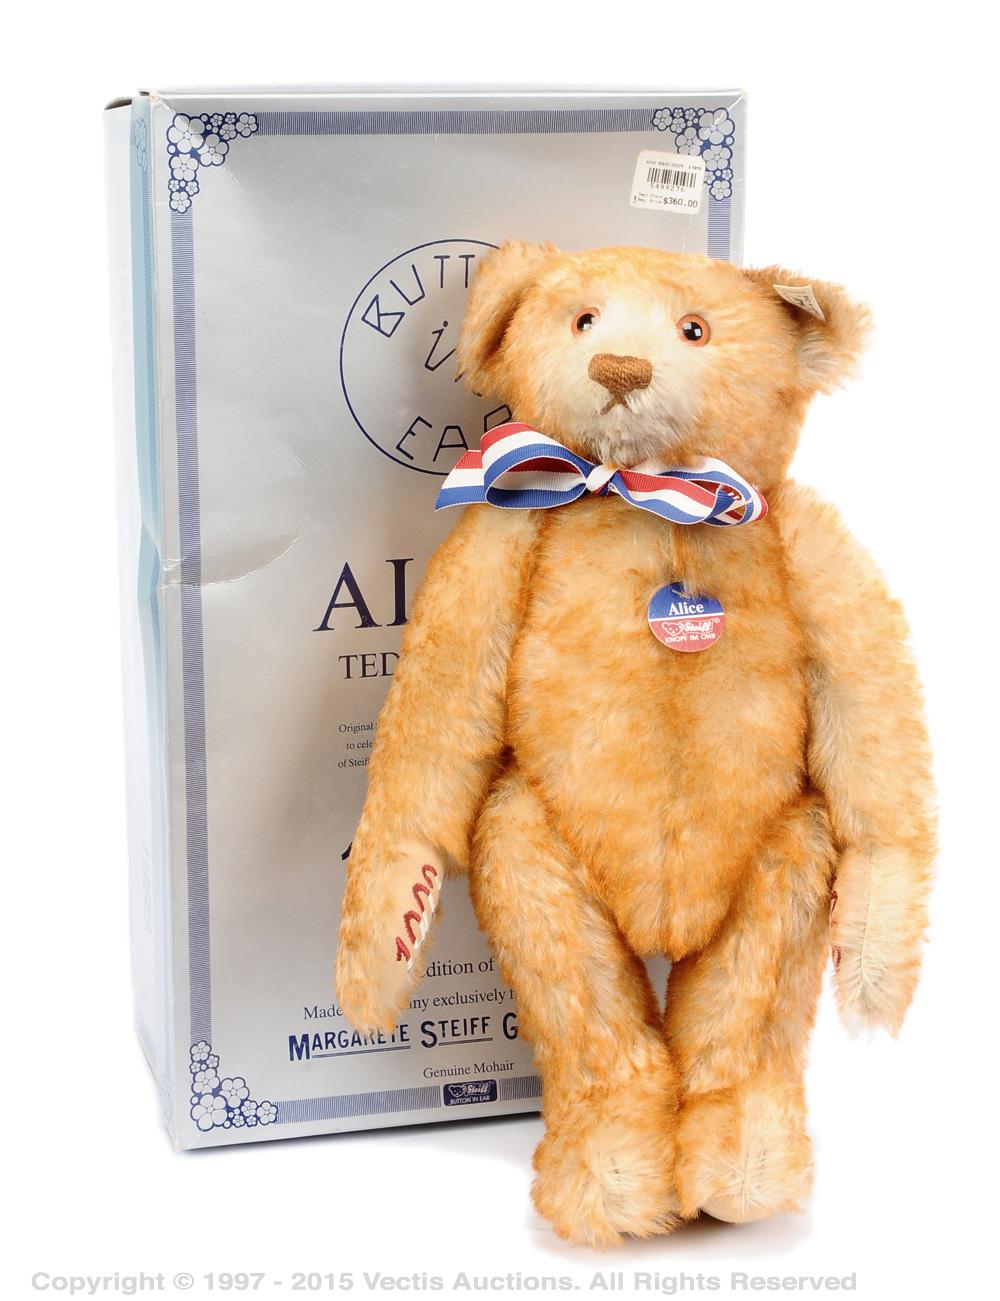 dolls teddy bears tinplate sale. Black Bedroom Furniture Sets. Home Design Ideas